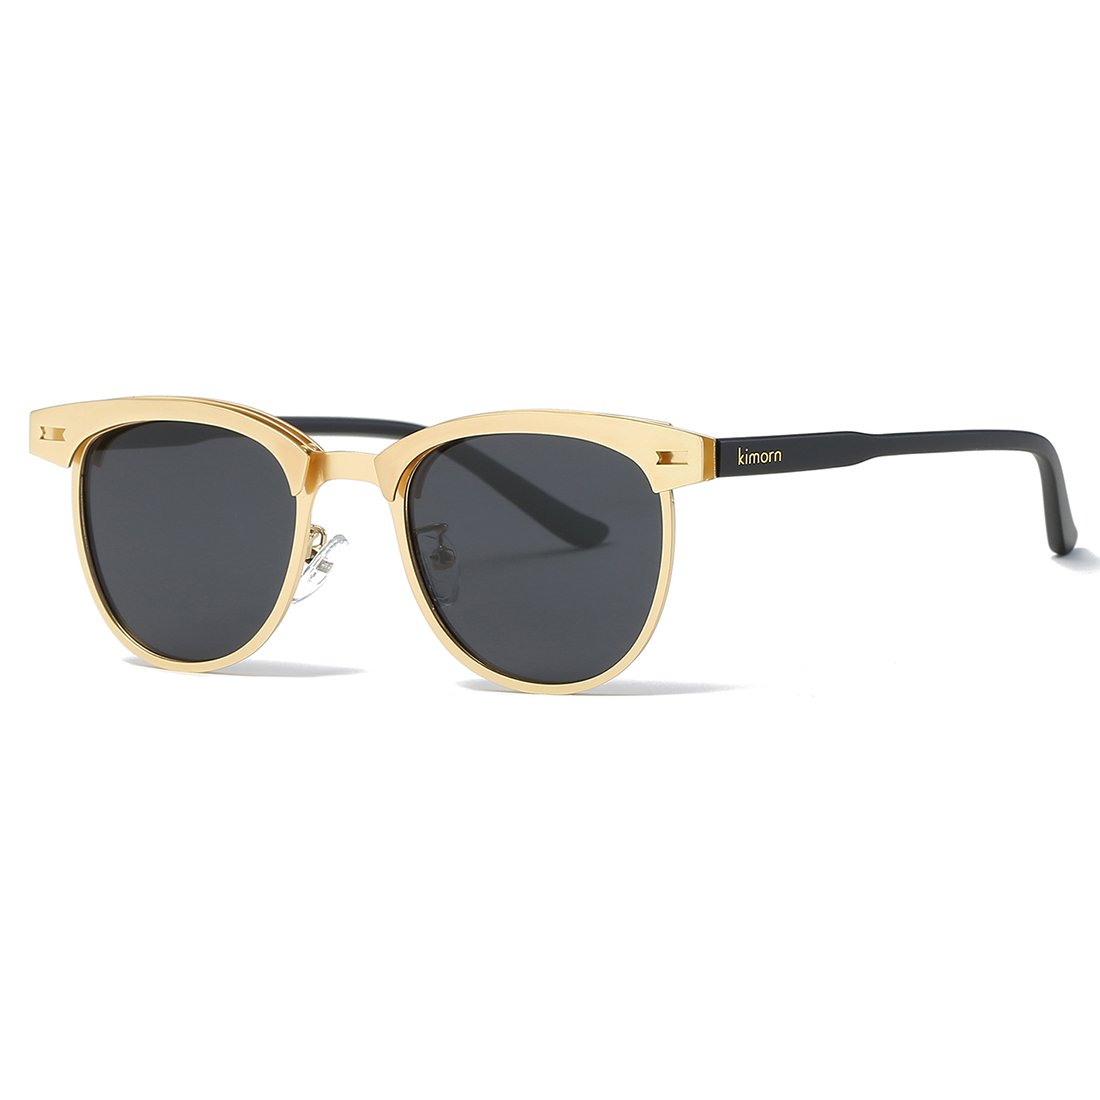 Kimorn Polarisierte Sonnenbrille Unisex Retro Halb-Randlos Metall ...